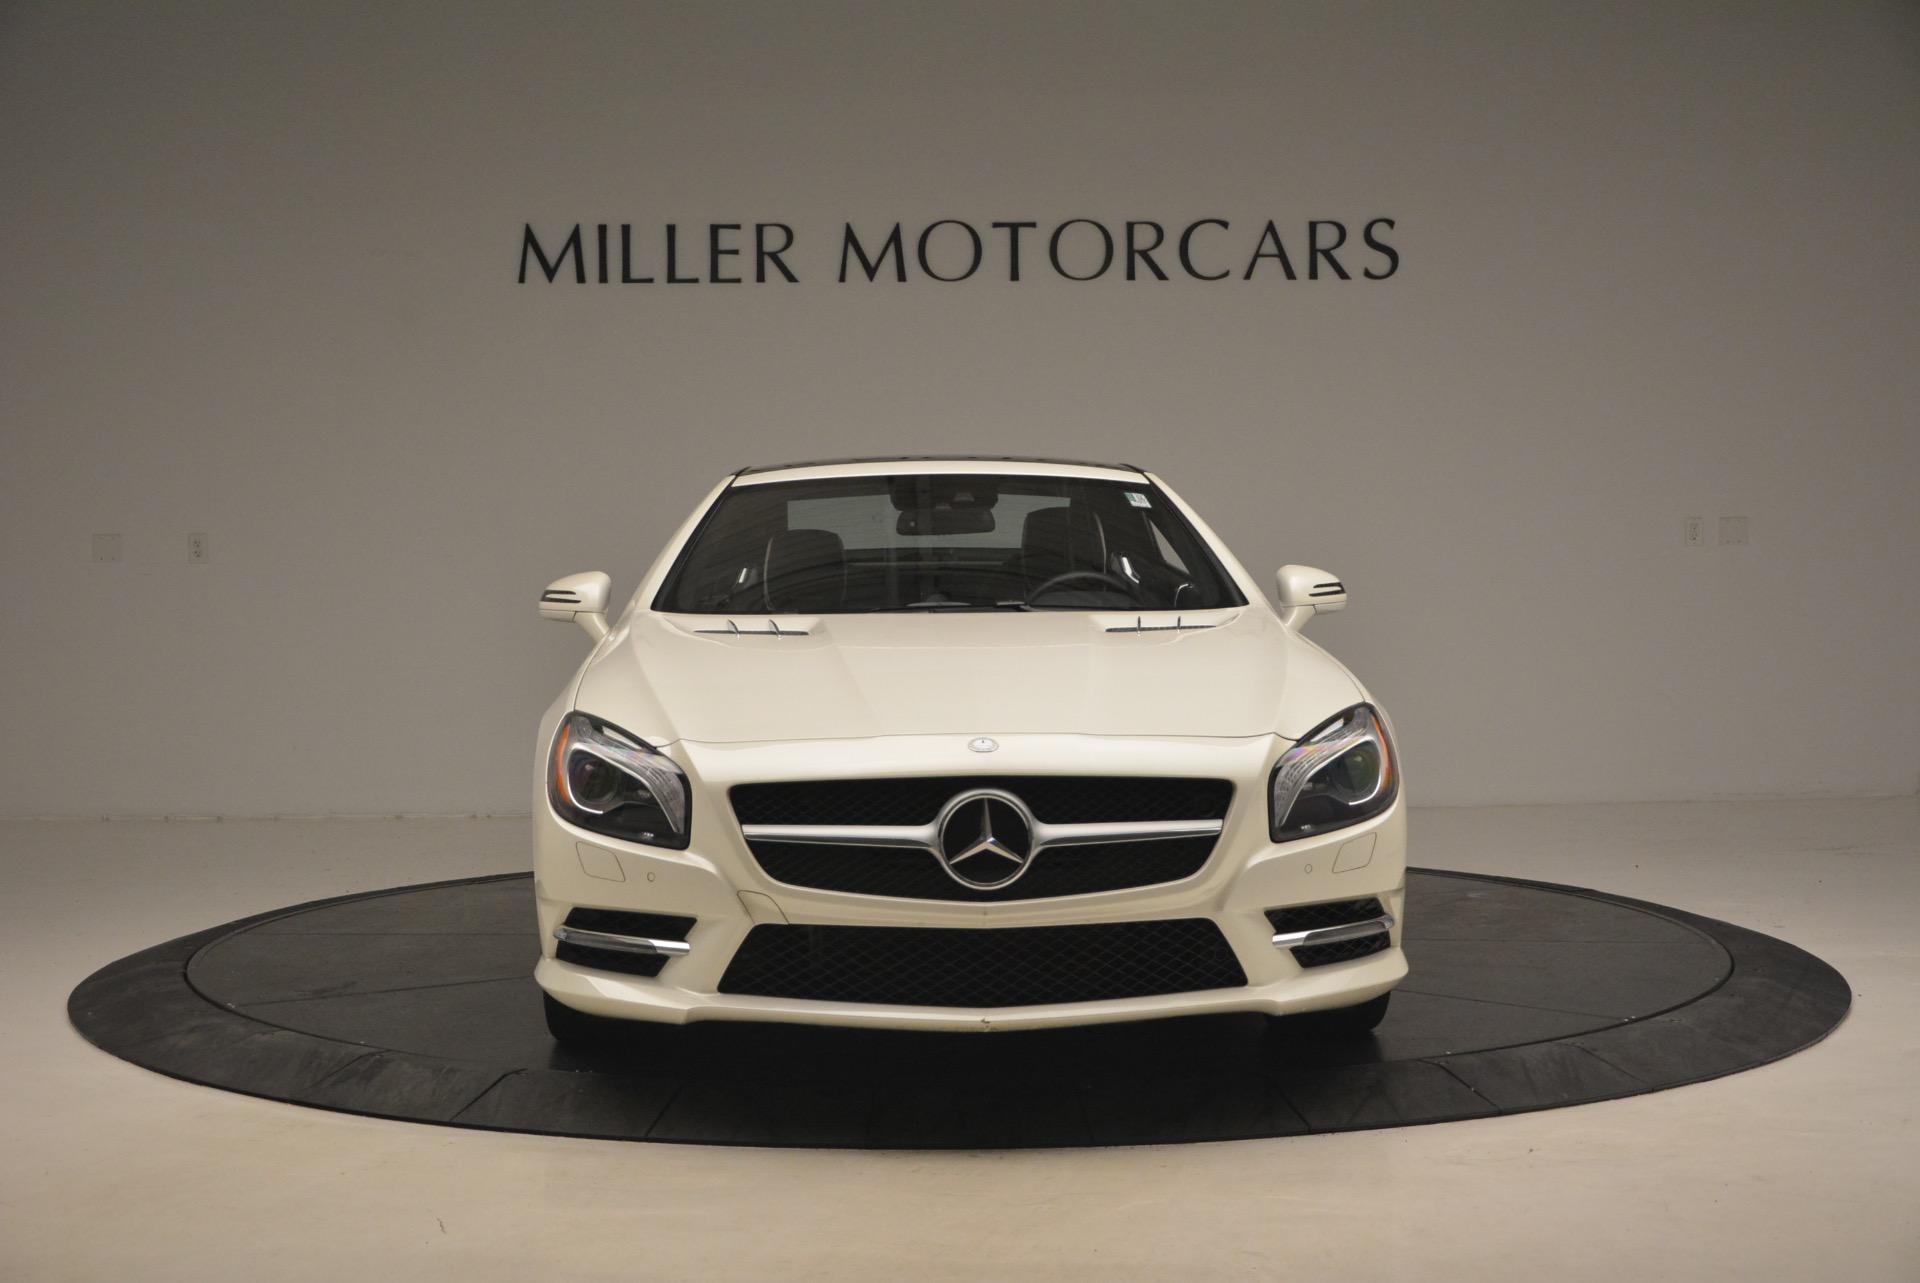 Used 2015 Mercedes Benz SL-Class SL 550 For Sale In Greenwich, CT. Alfa Romeo of Greenwich, M1874A 1261_p14